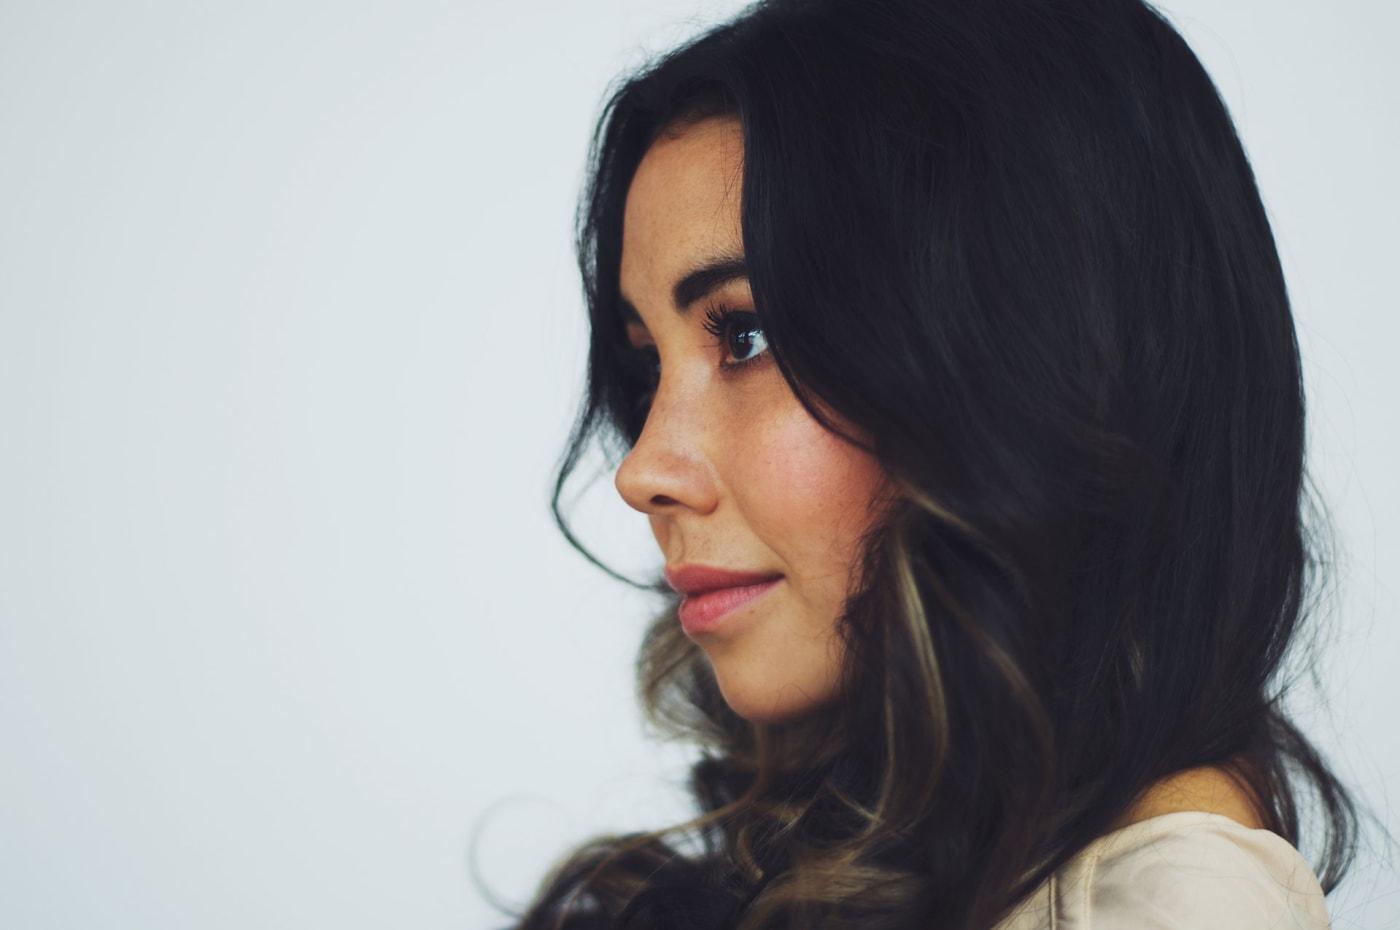 Indigenous Canadian TikTok influencer Marika Sila